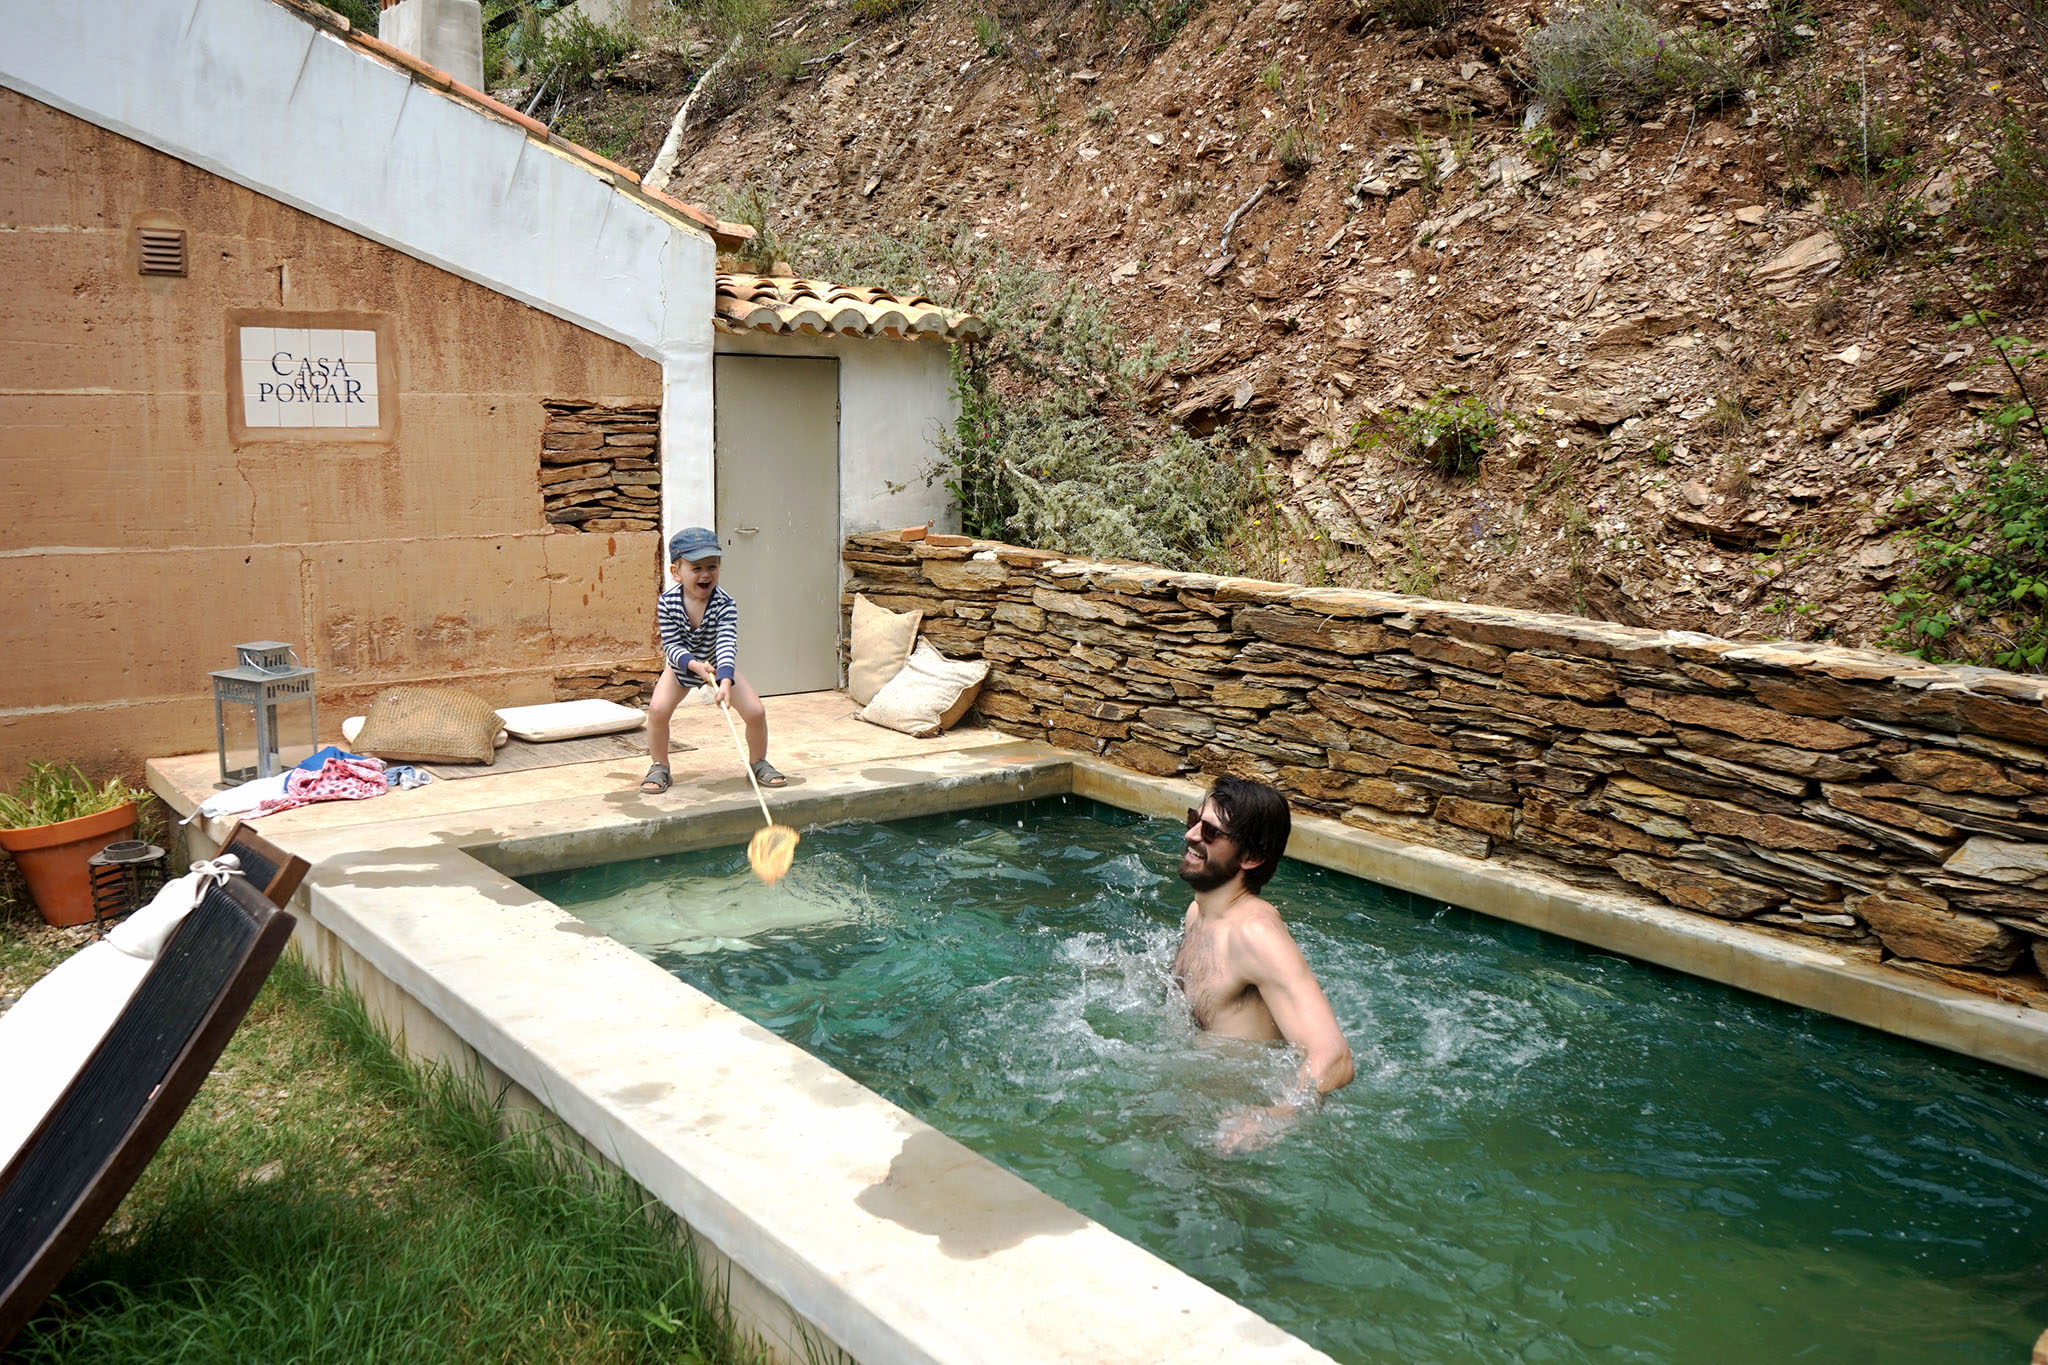 2017-04-Casas-da-Cerca-Portugal - casas-da-cerca-portugal-nectarandpulse-pool-8.jpg